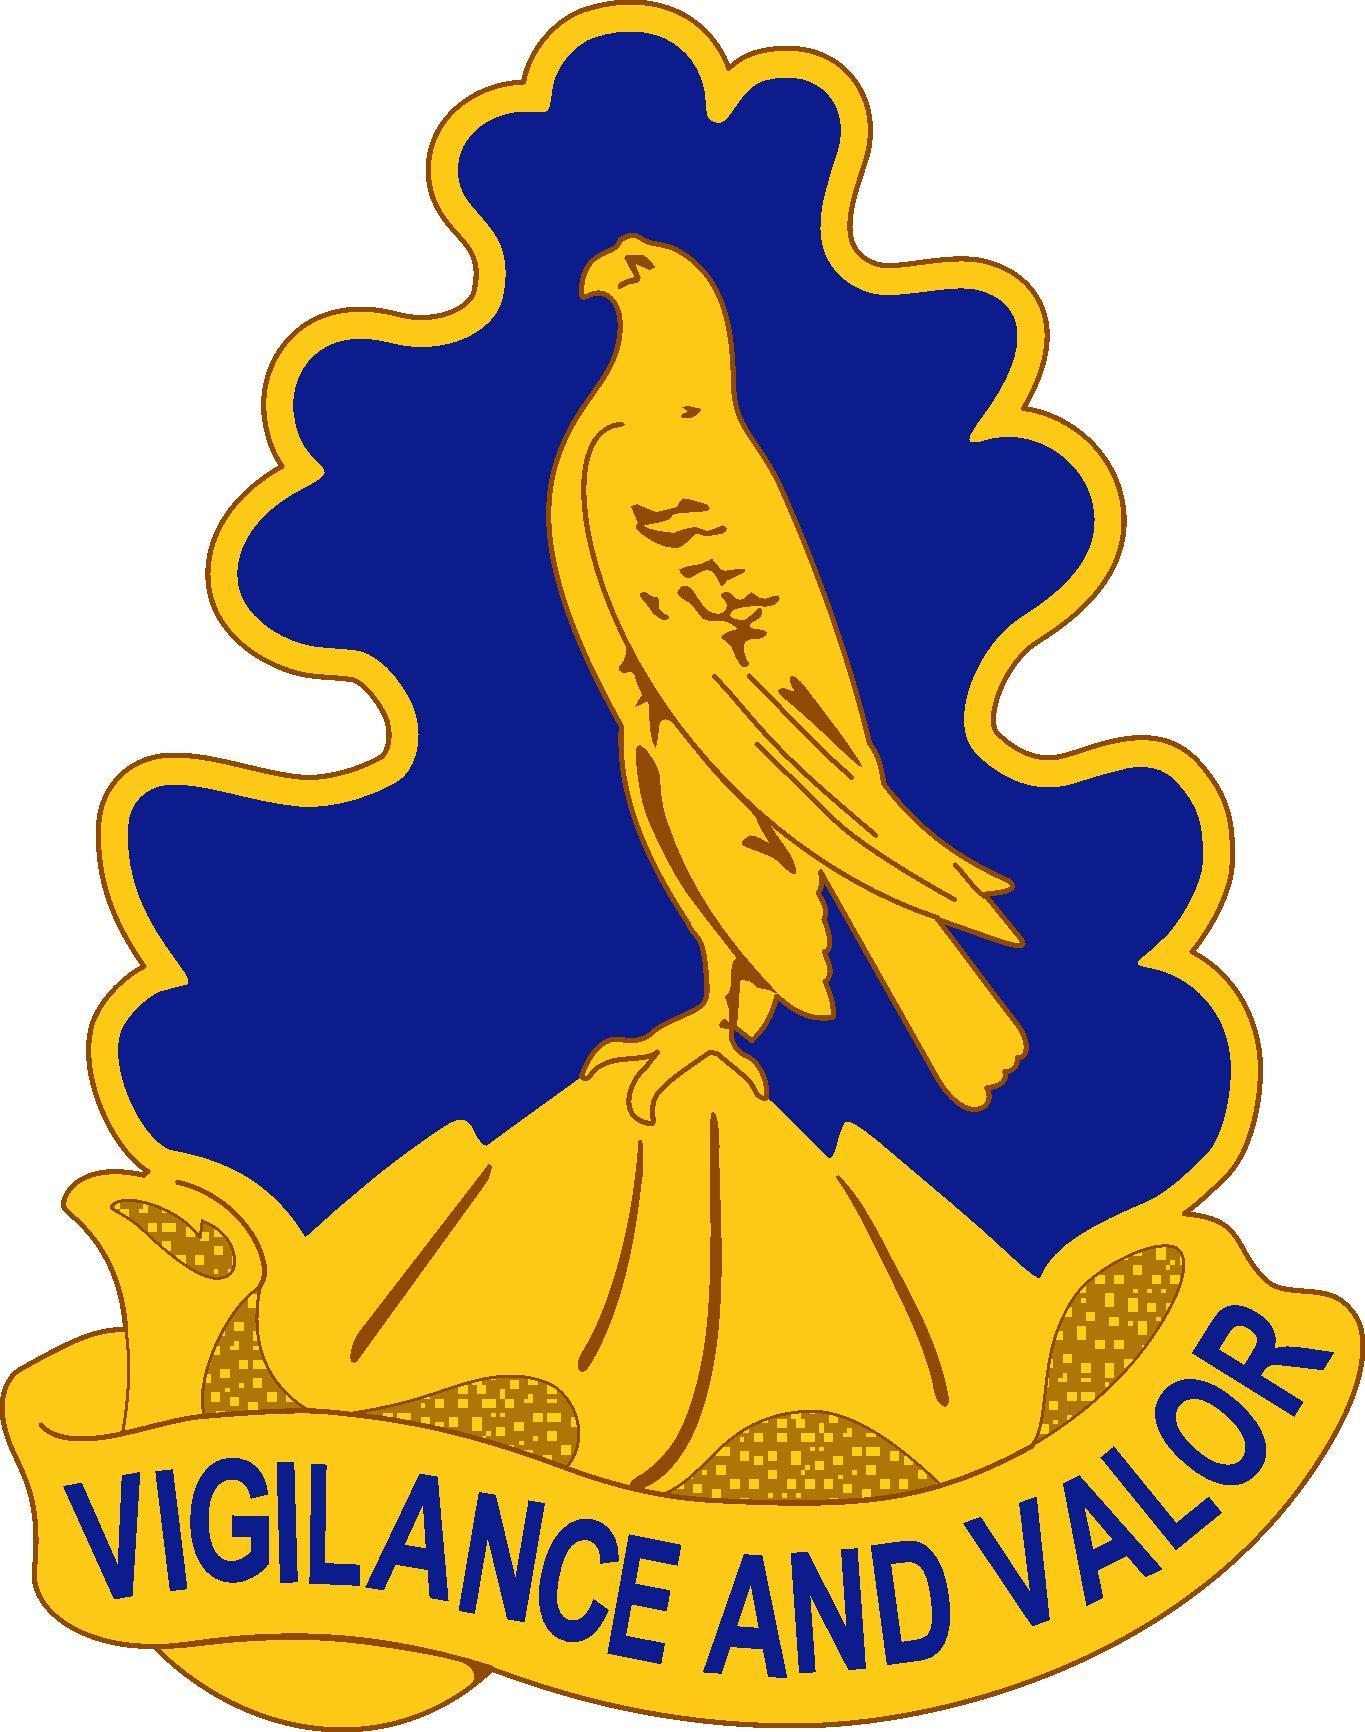 157th Infantry Regiment (United States)